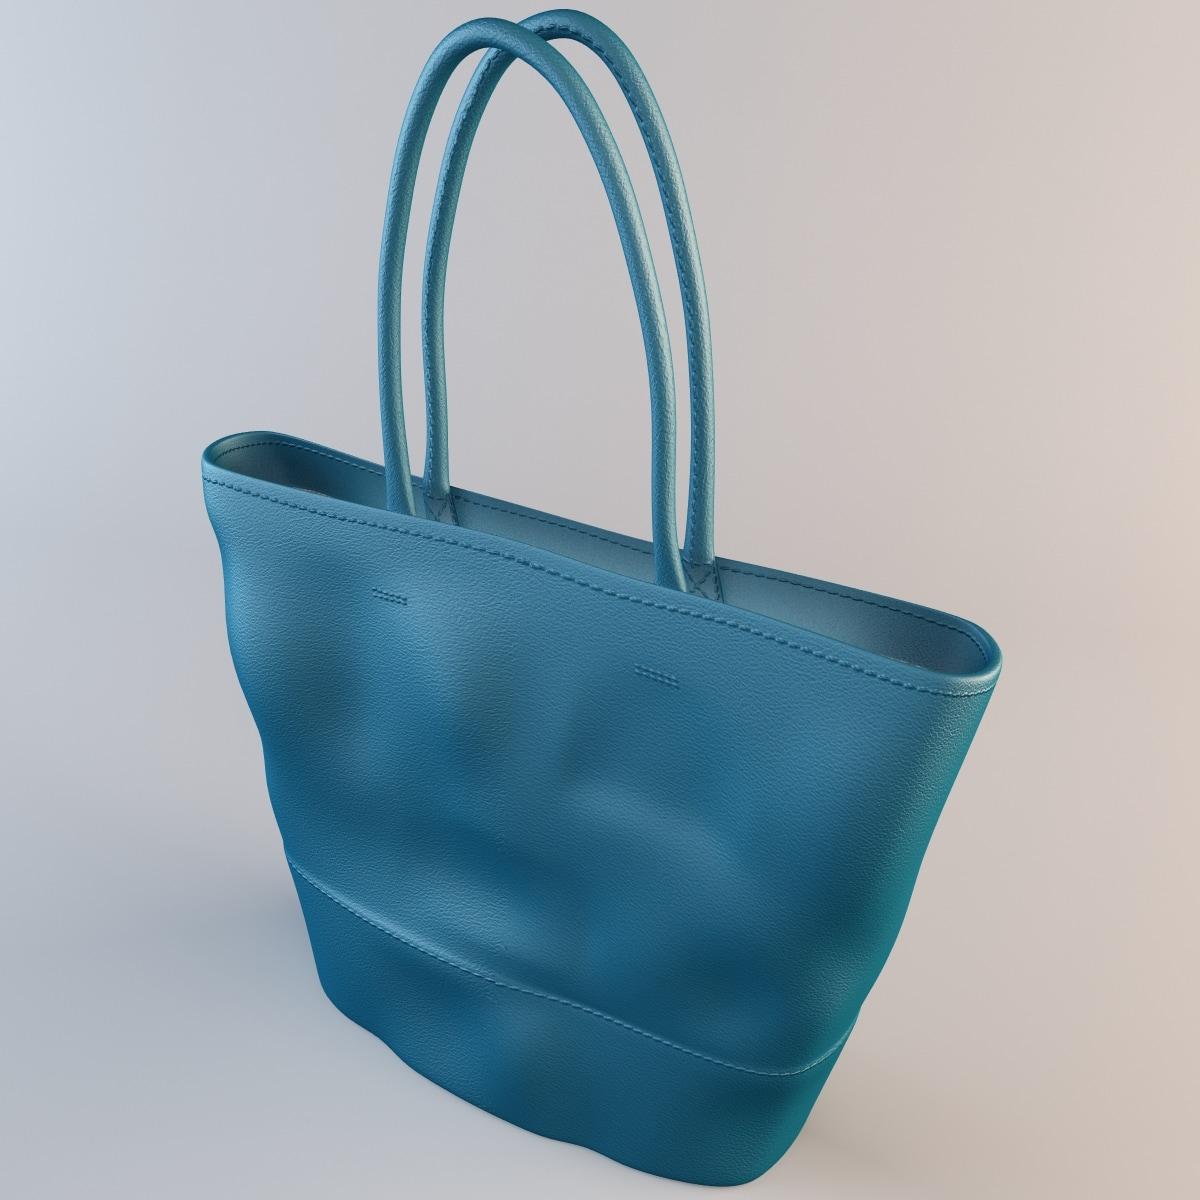 women handbag accessories 3d 3ds